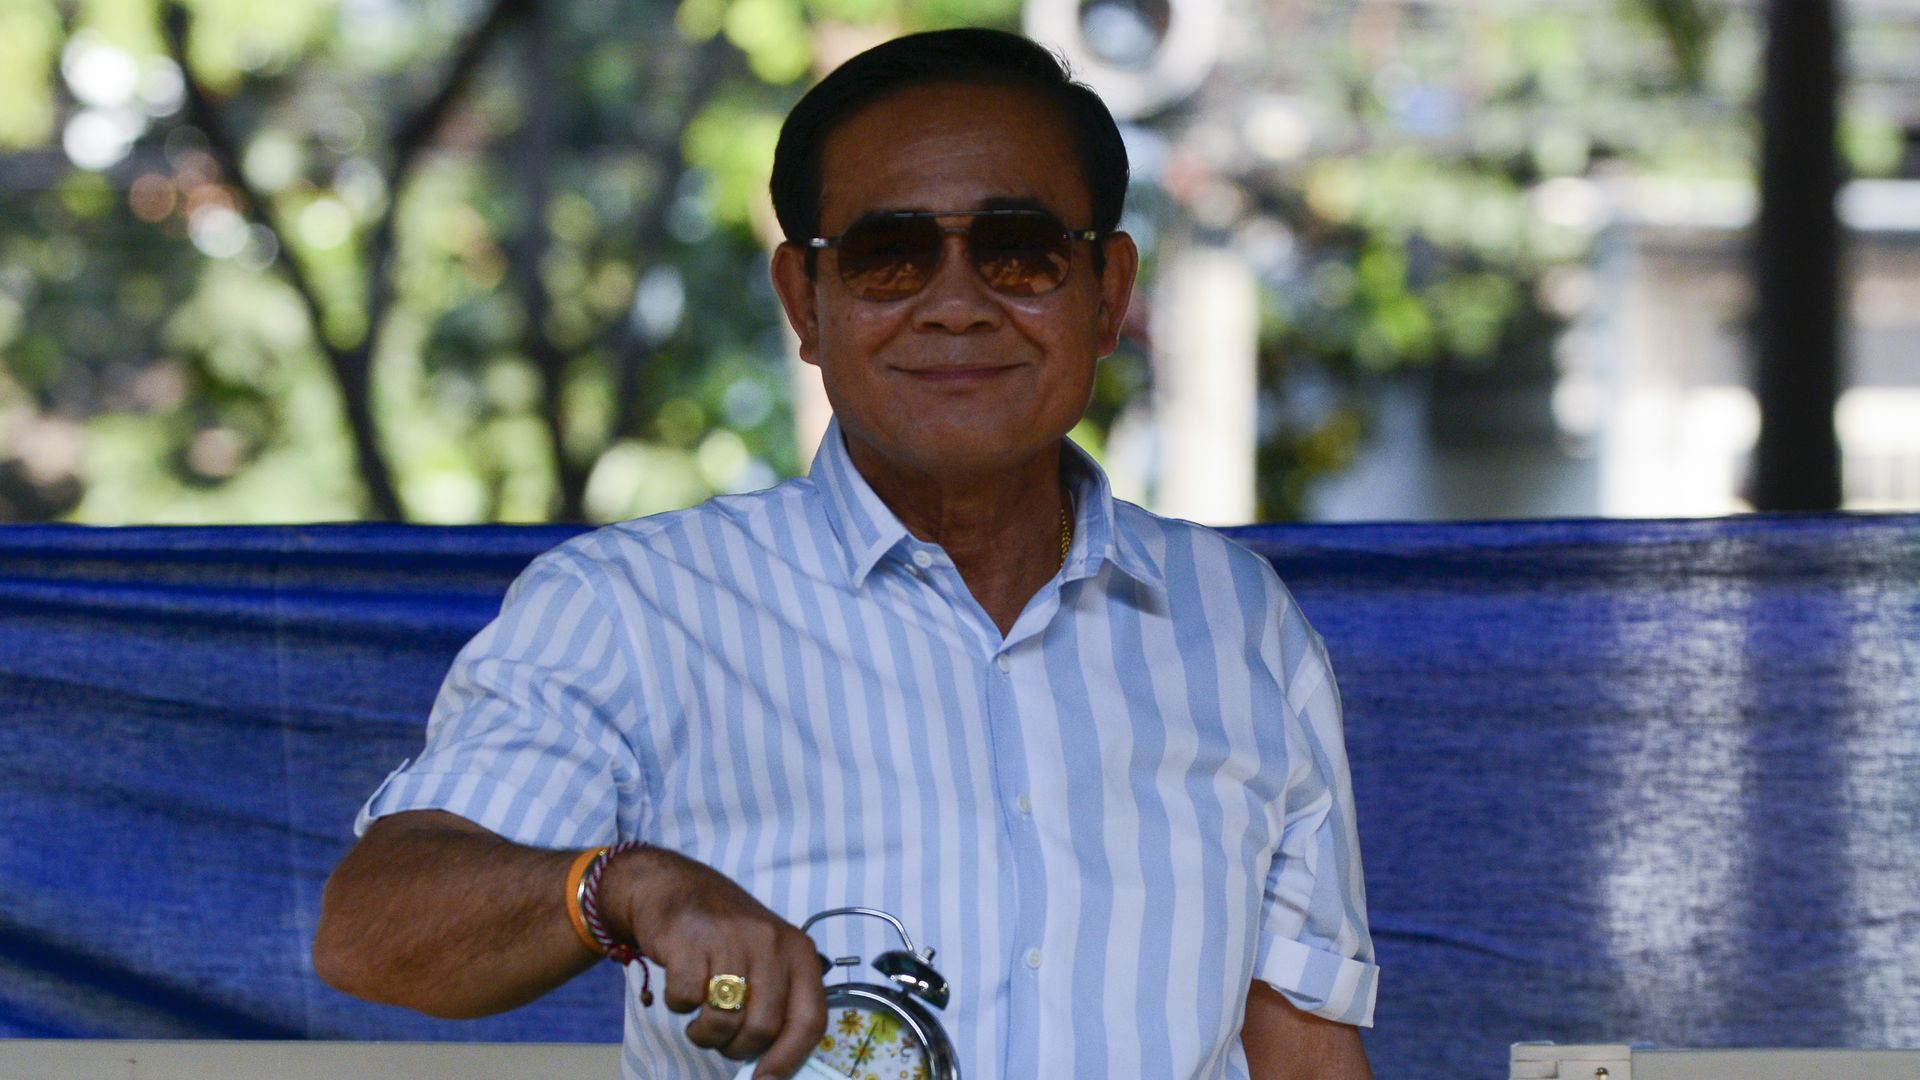 Thailand's Prime Minister Prayuth Chan-Ocha casting his vote.